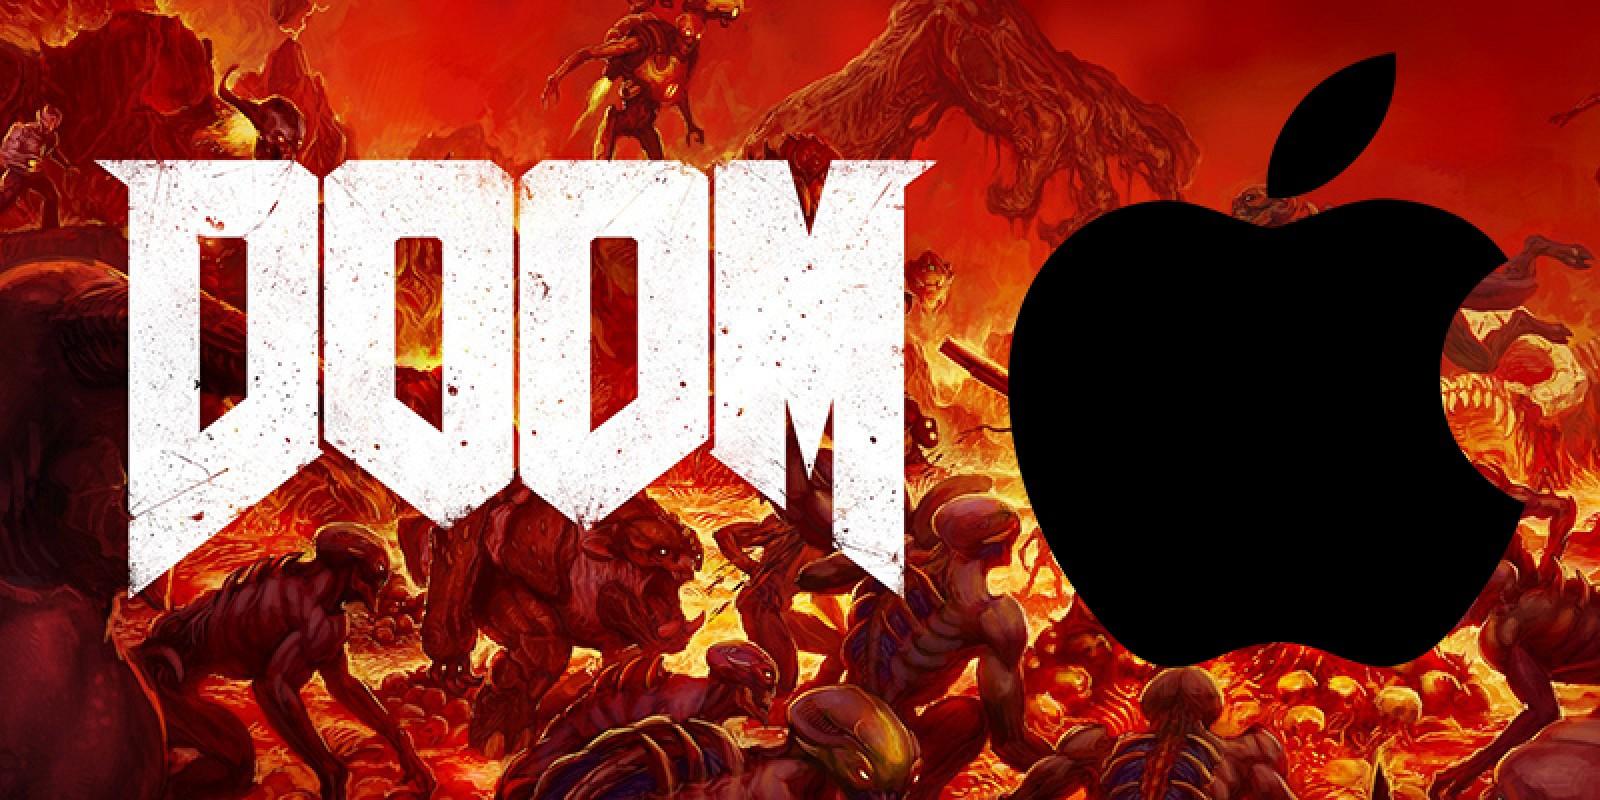 Doom Creator John Carmack Shares His Interactions With Steve